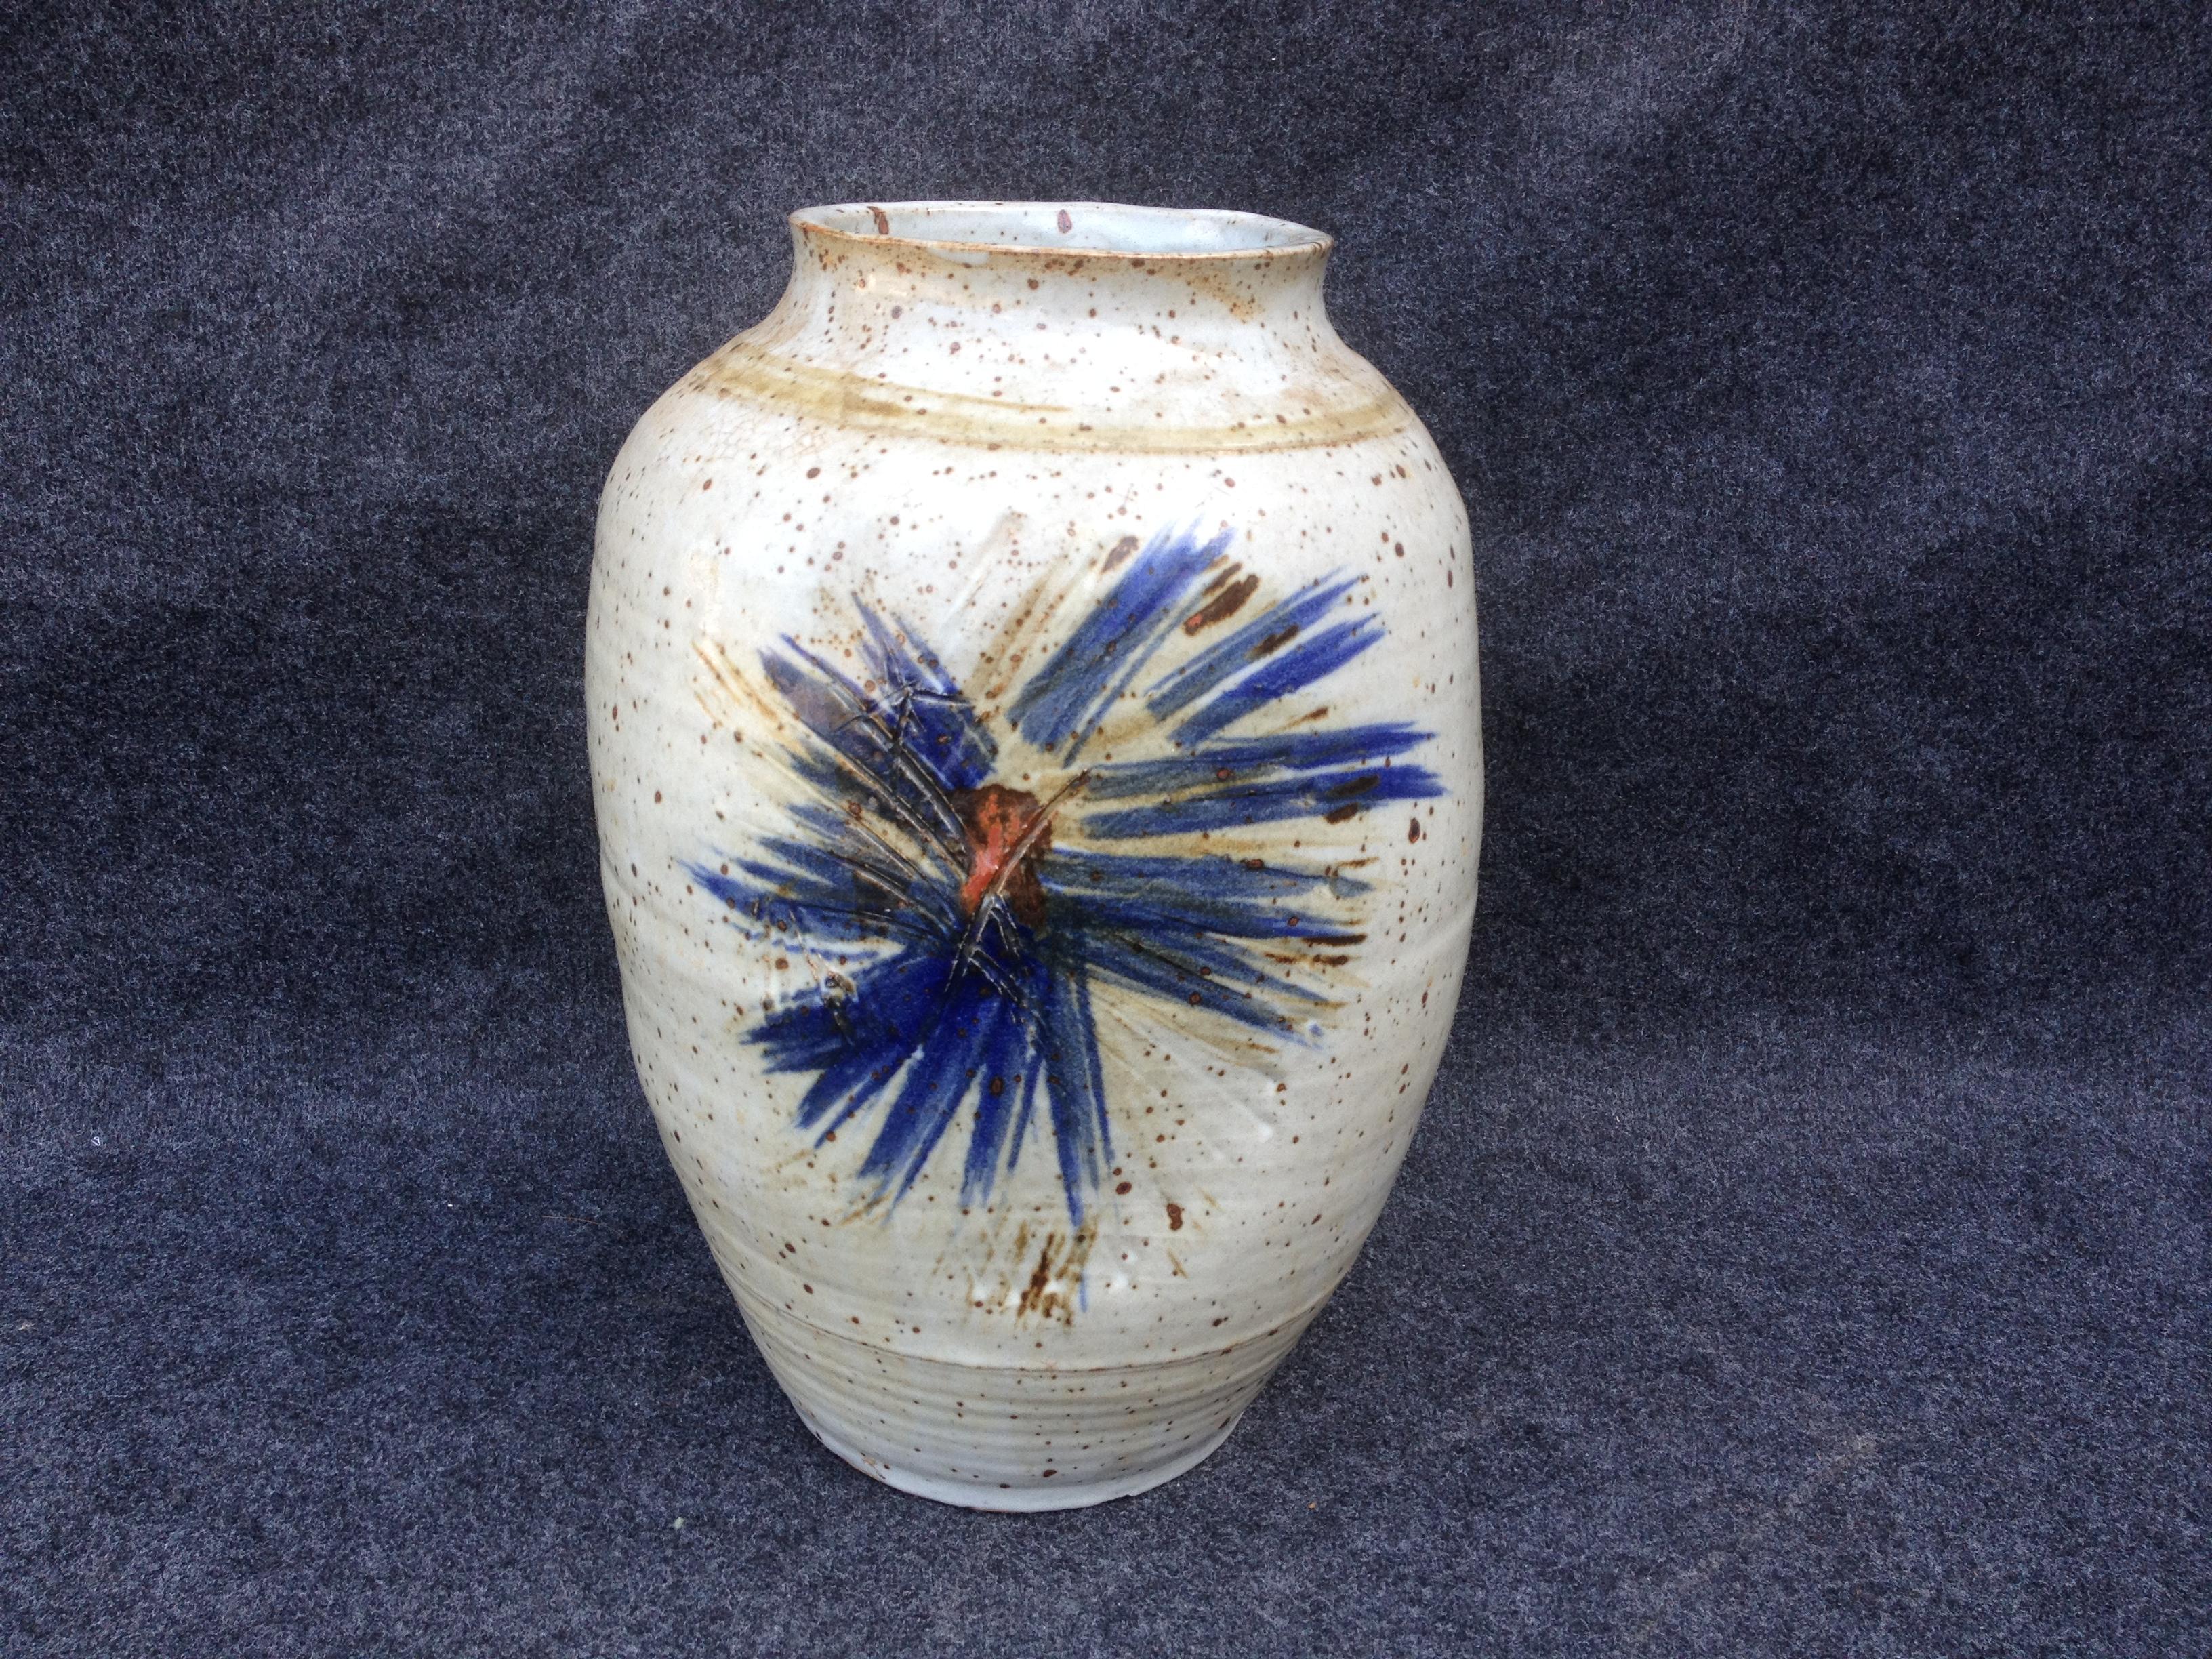 Large signed oval Studio pottery Vase (1 of 1)